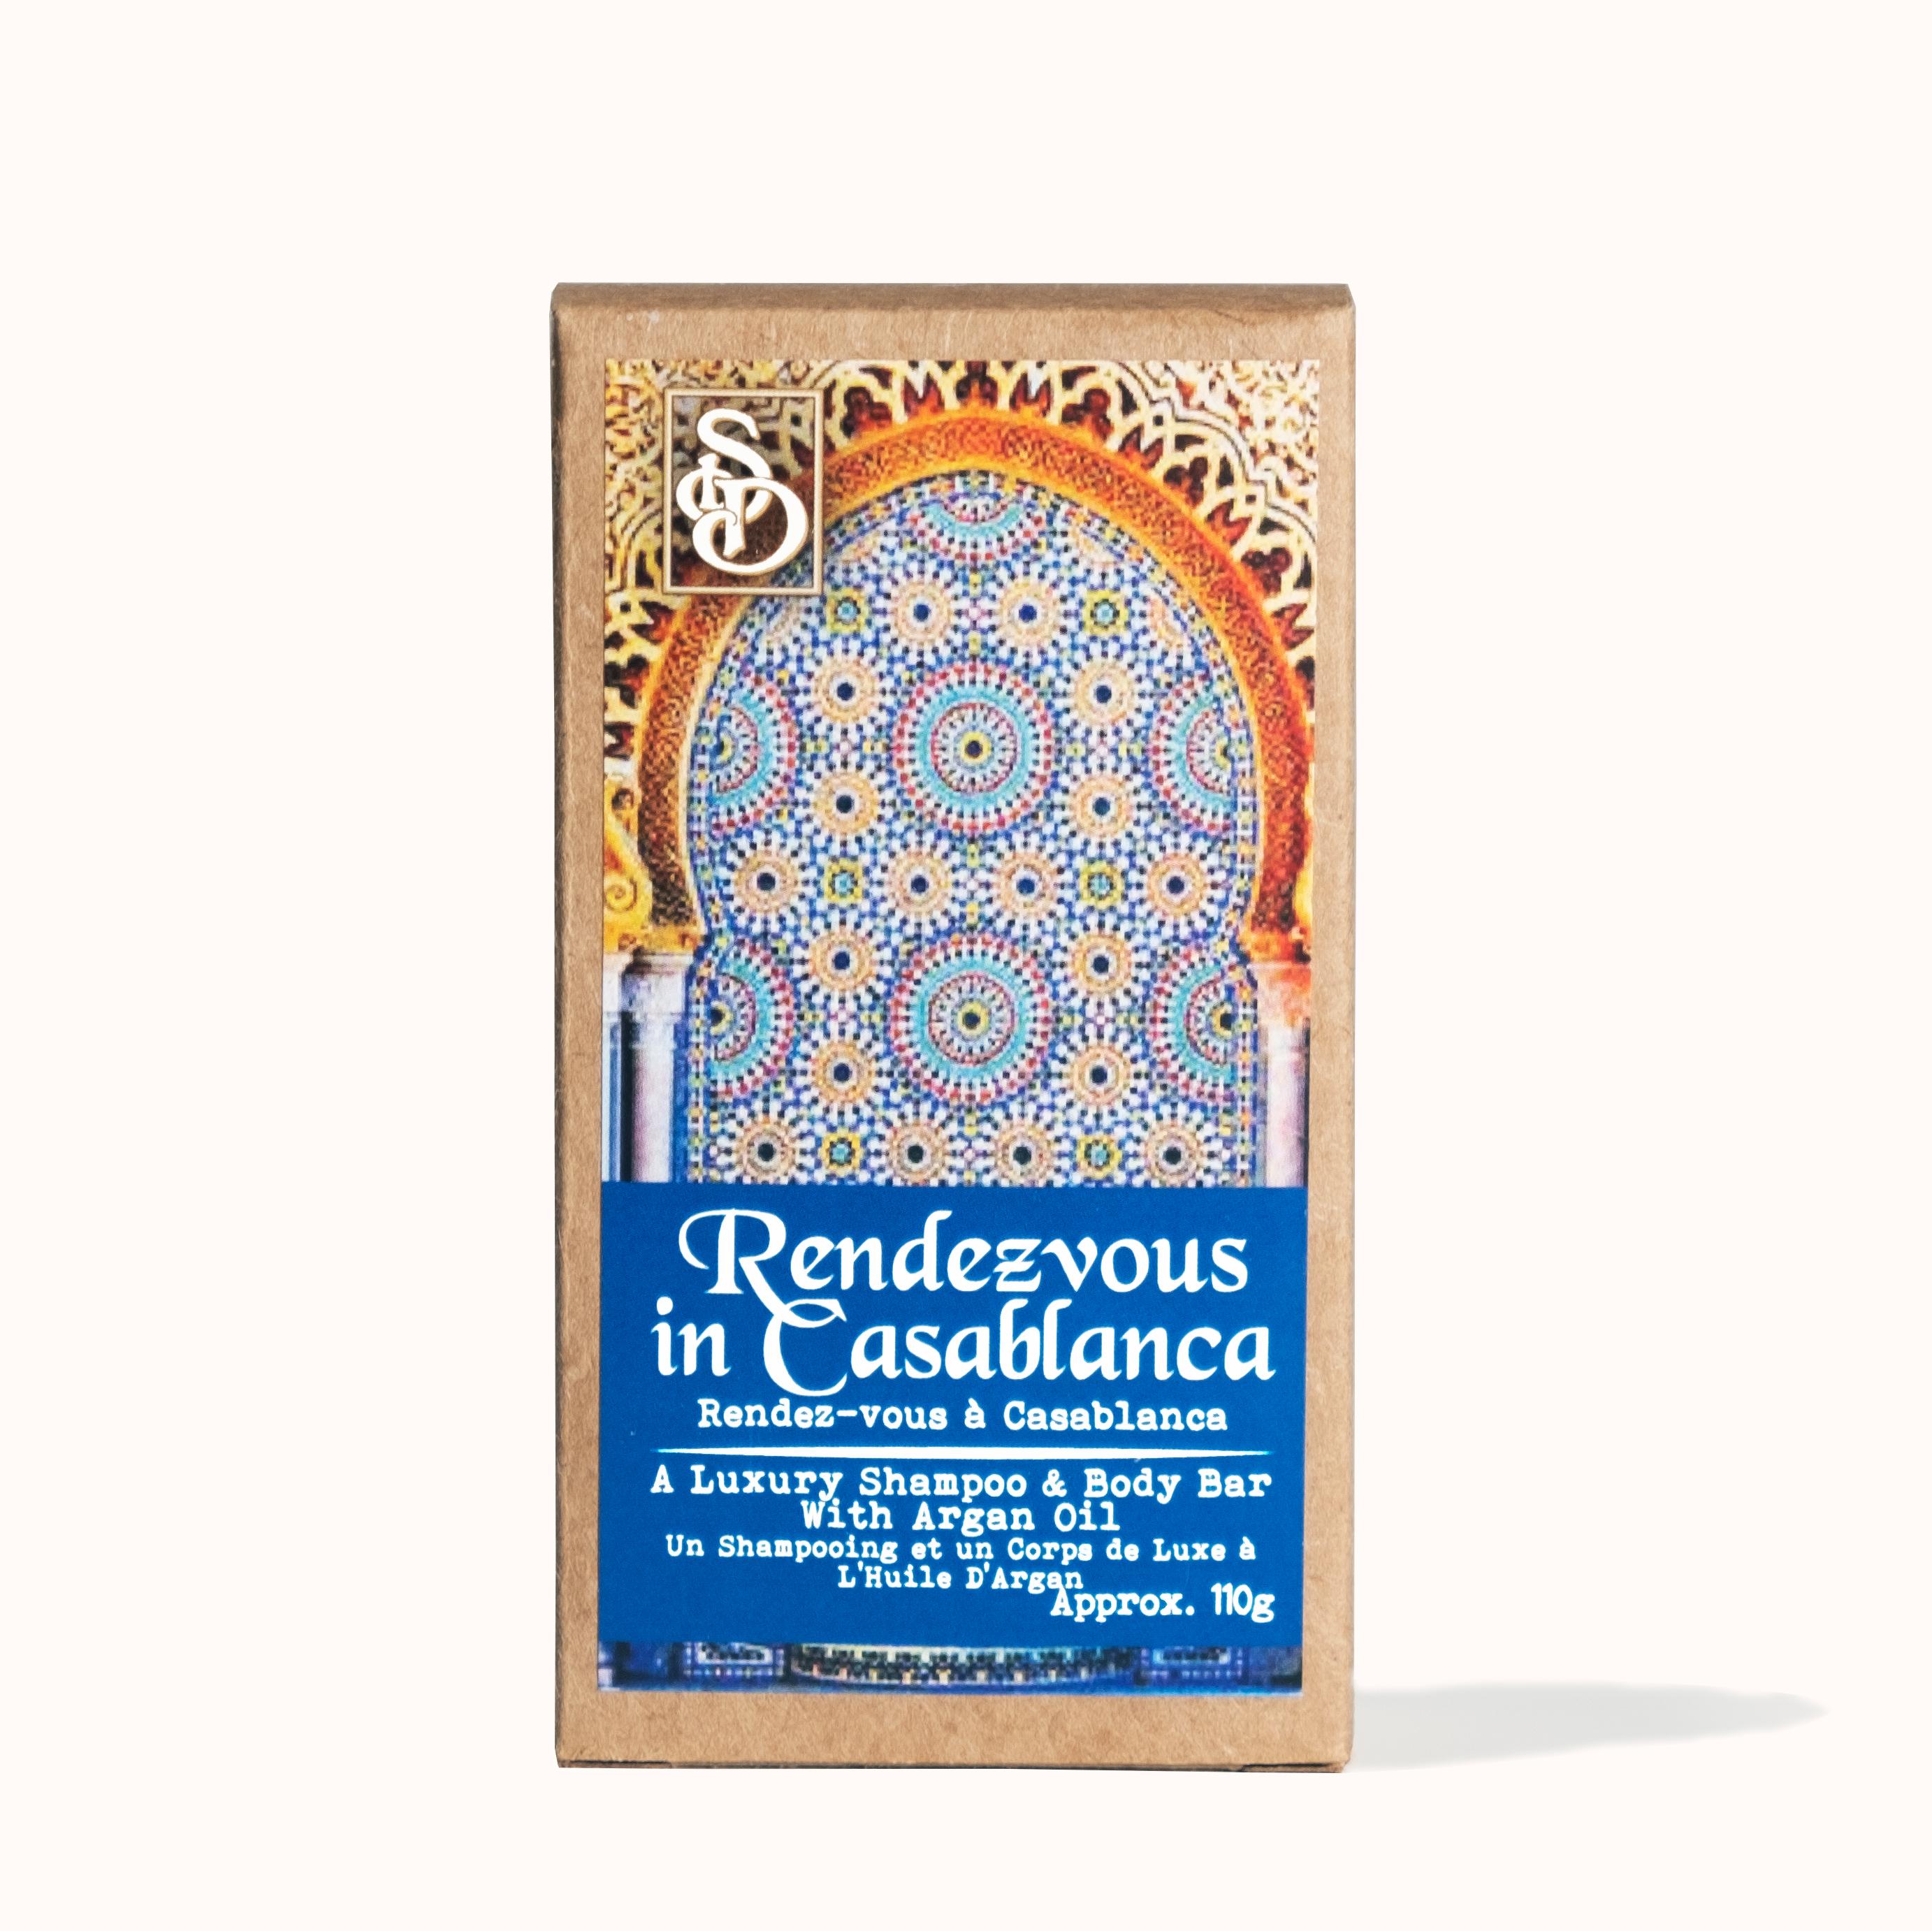 Rendezvous in Casablanca | Shampoo & Body